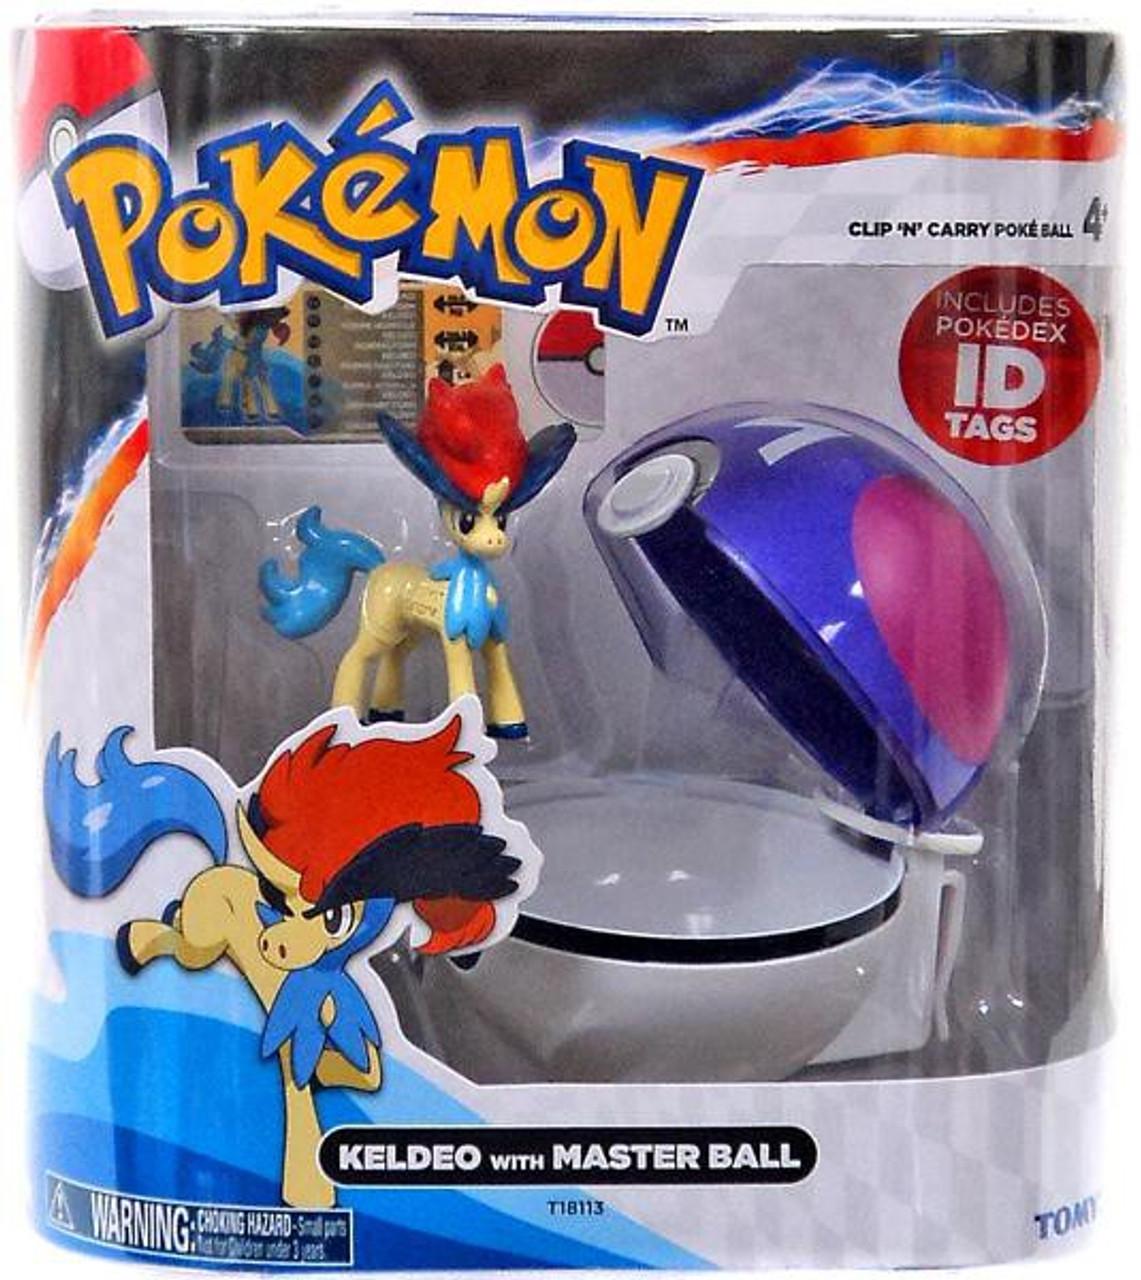 Pokemon Clip n Carry Pokeball Keldeo with Master Ball Figure Set